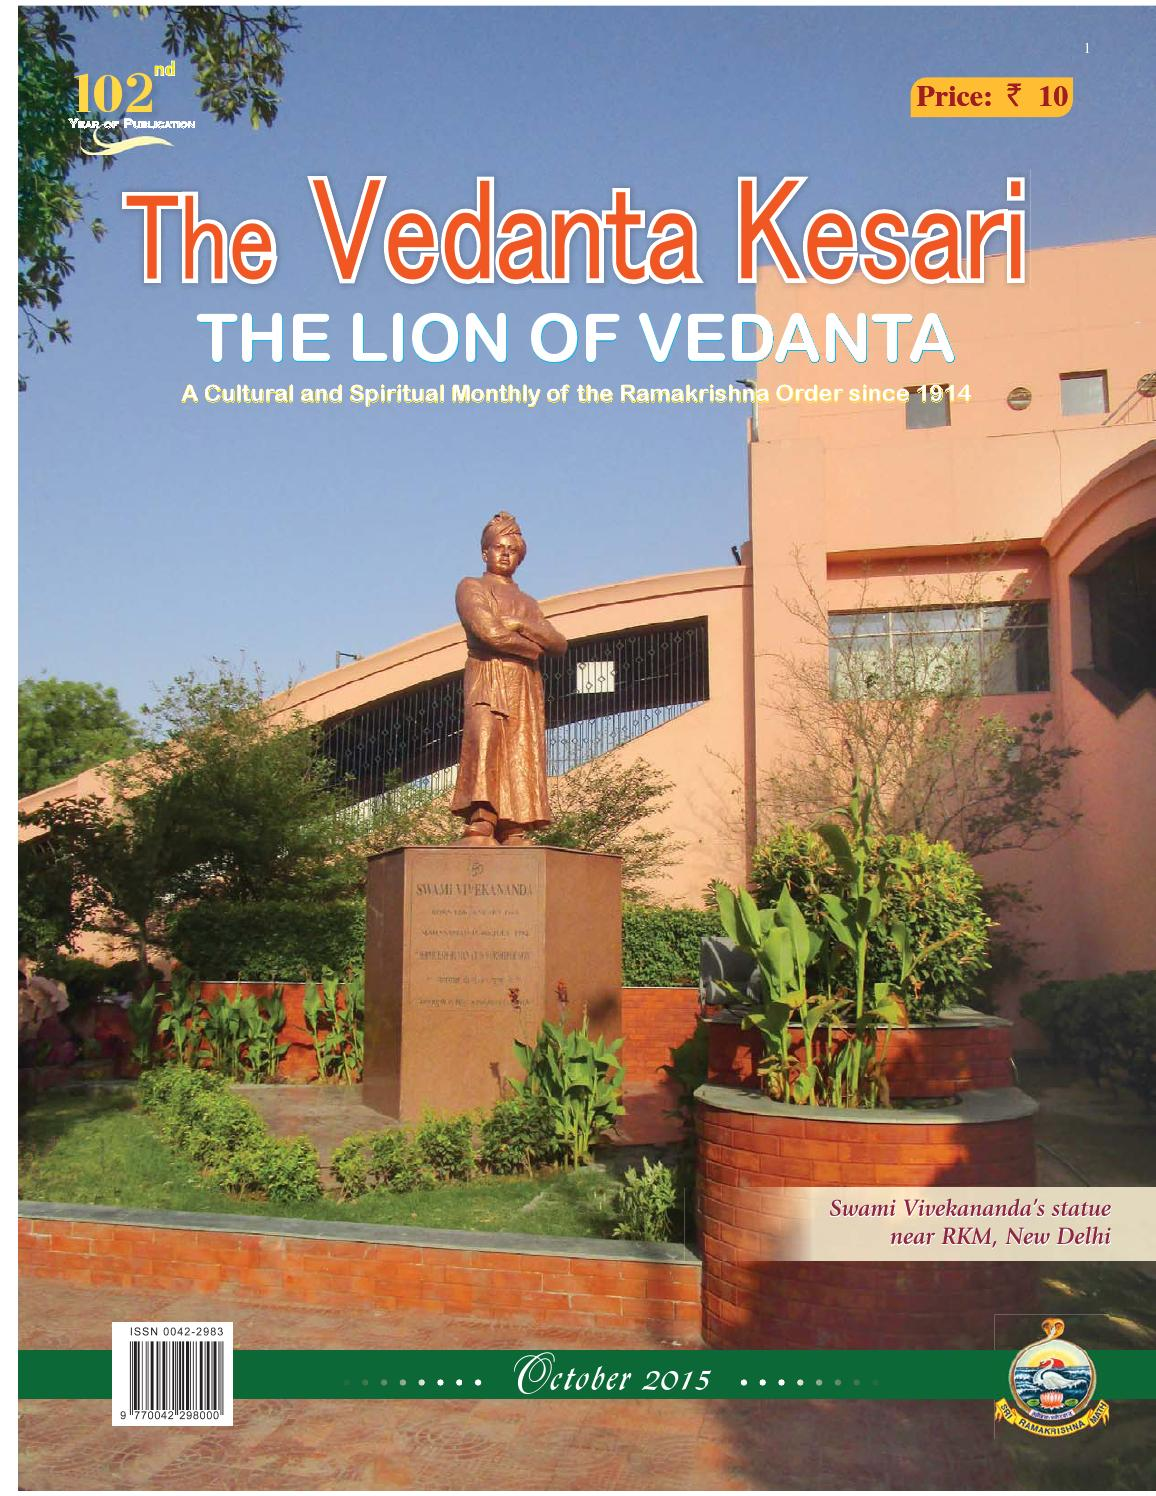 The Vedanta Kesari October 2015 issue by Sri Ramakrishna